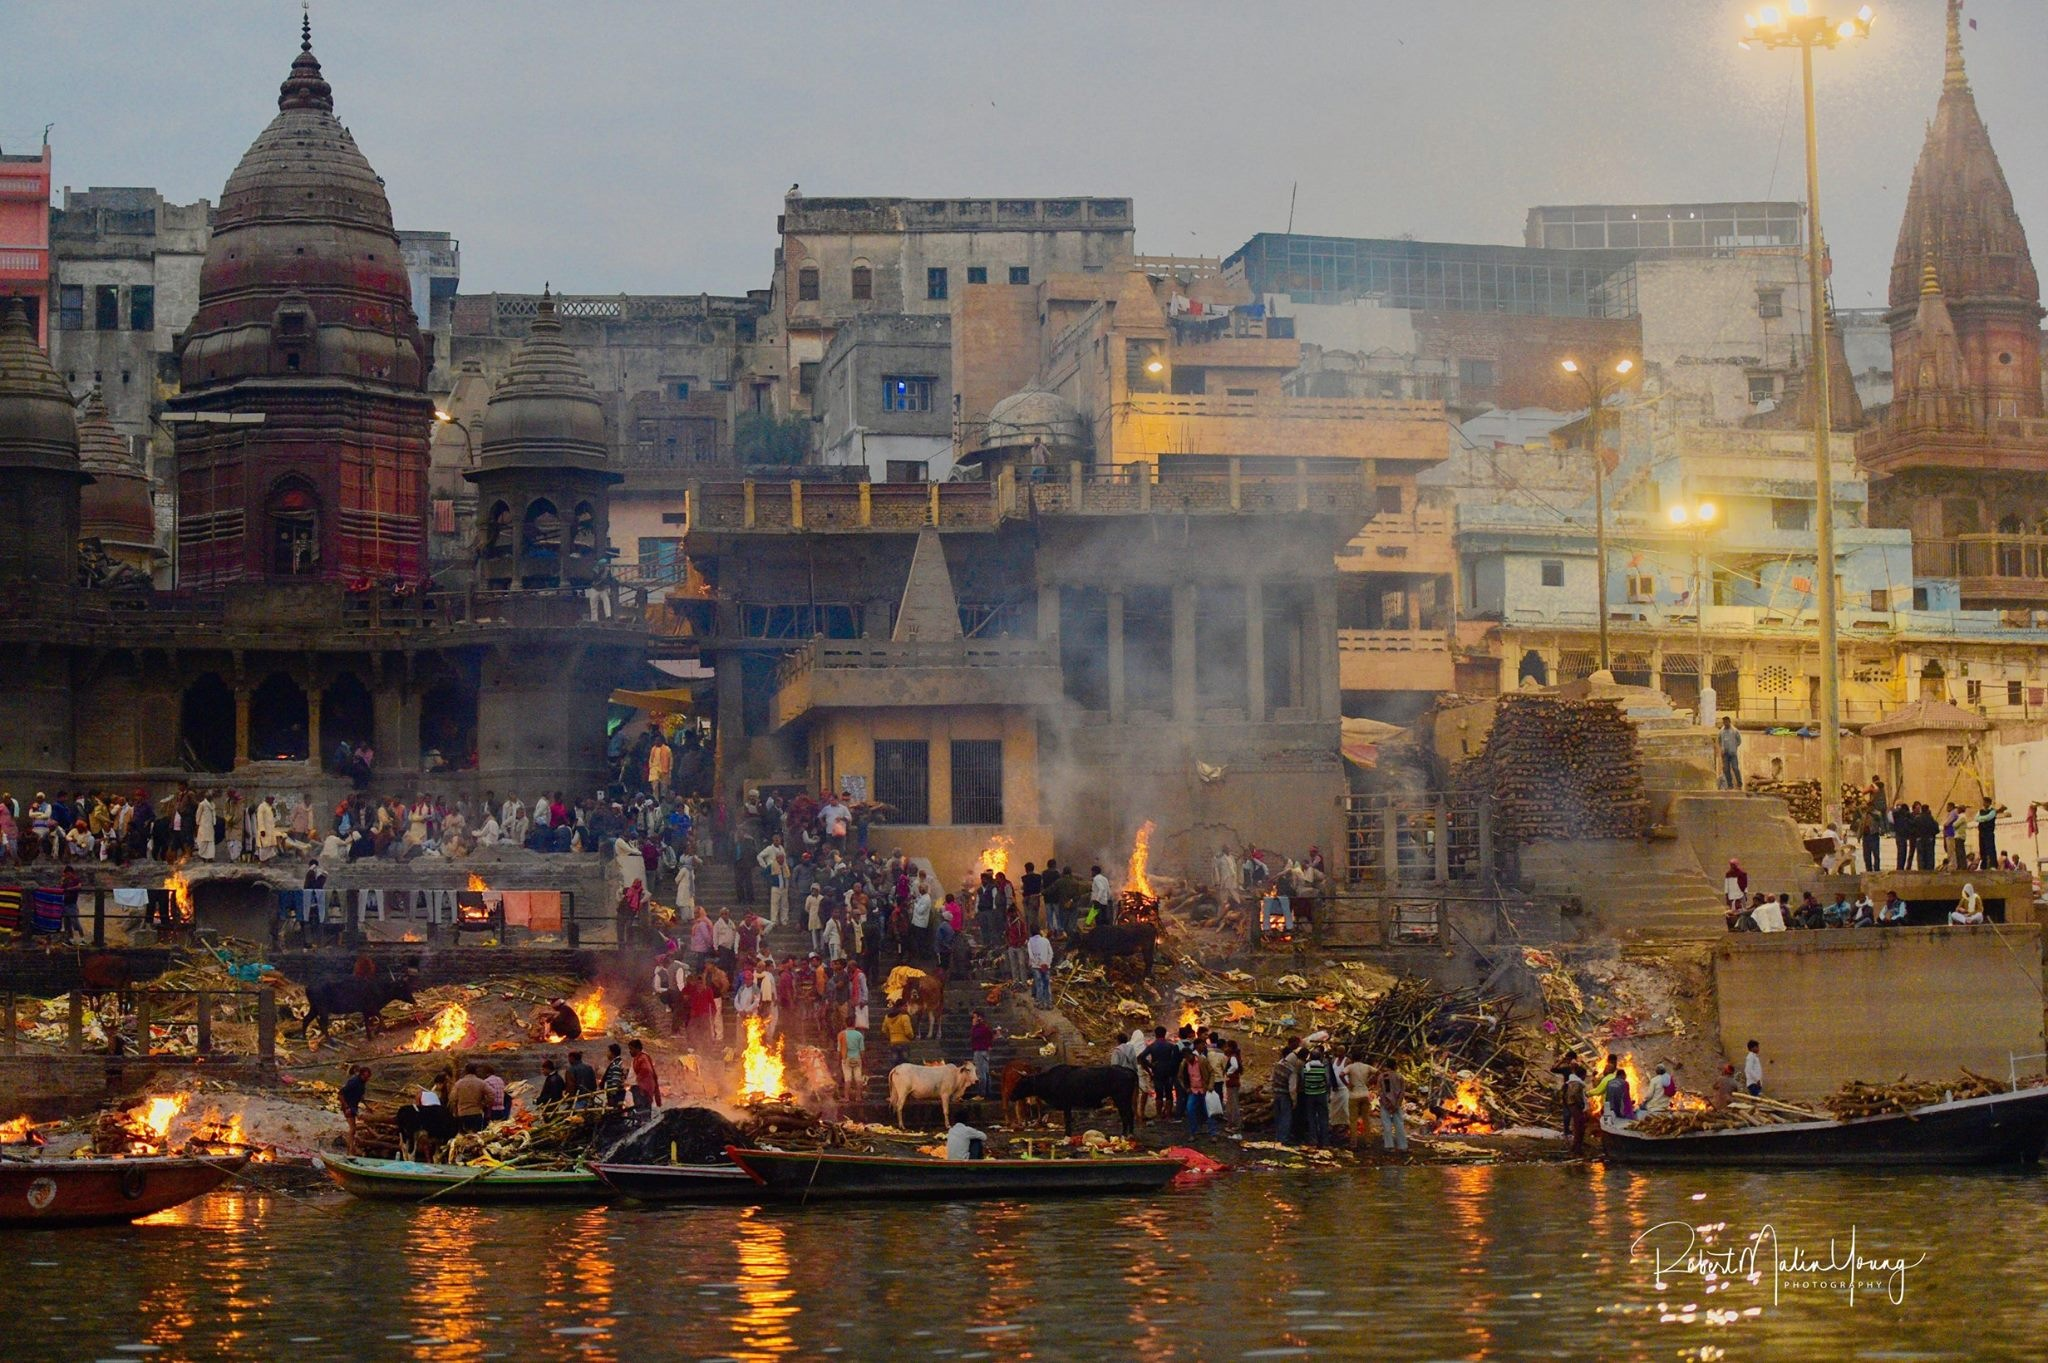 India 2018 by Robert Malin Young